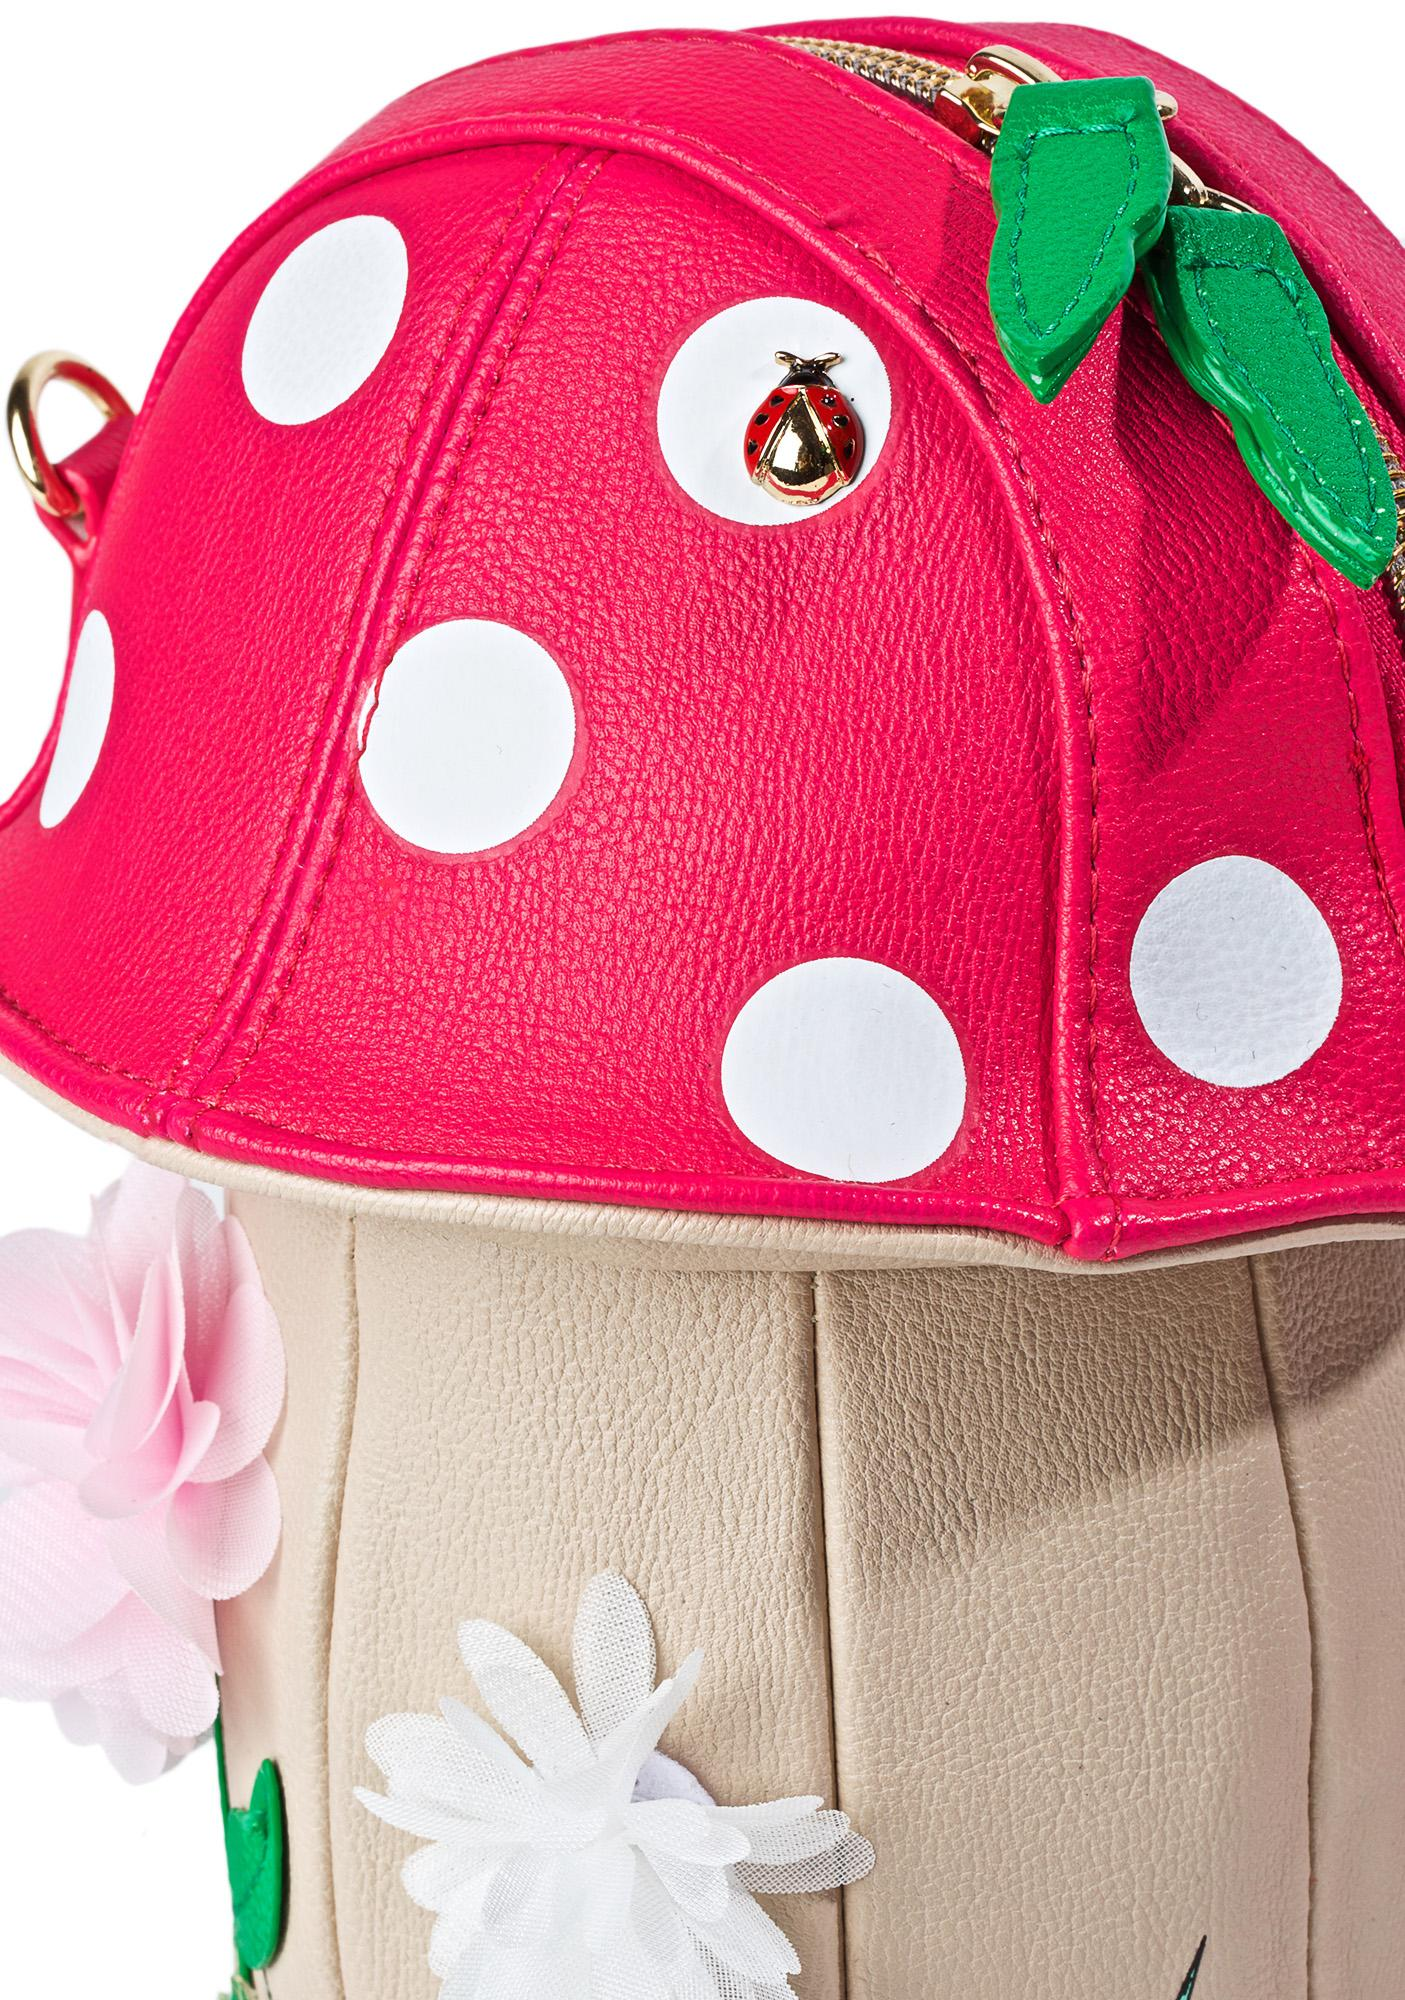 Betsey Johnson Shroomin' Crossbody Bag